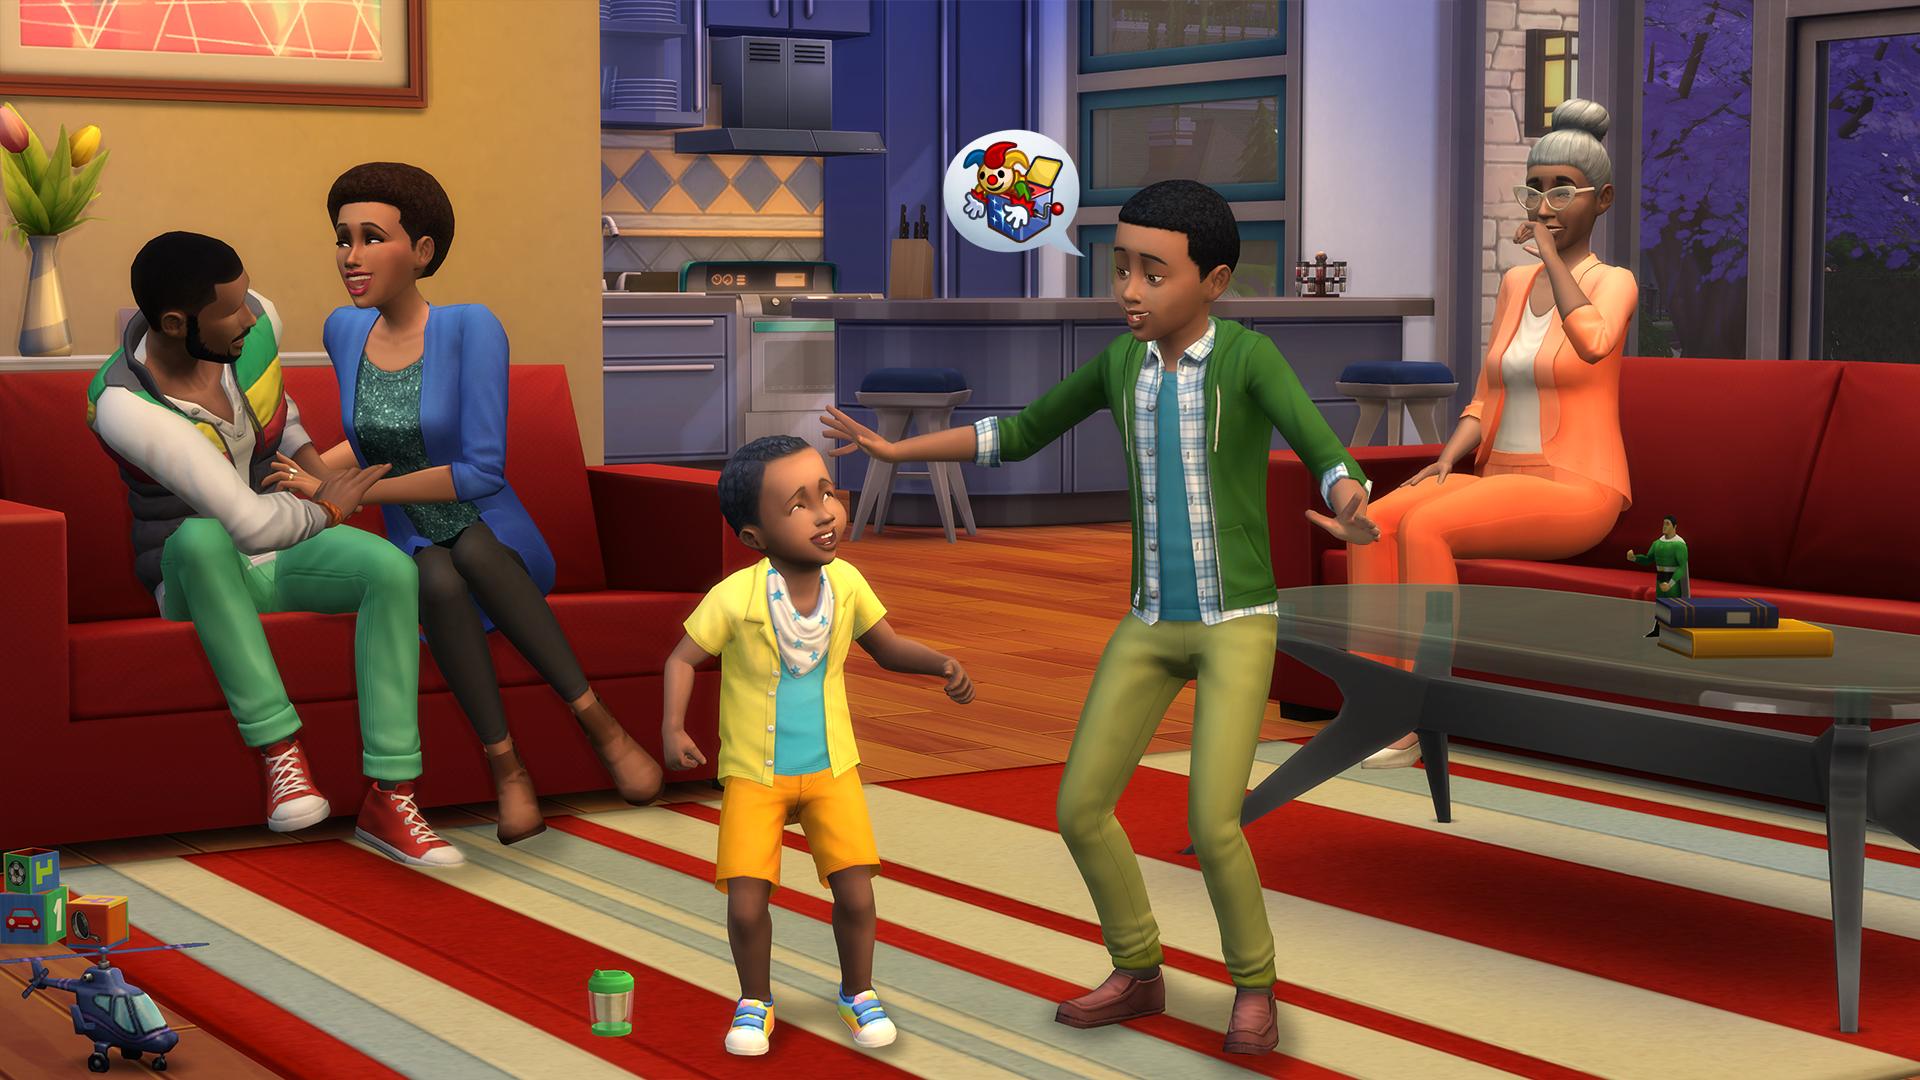 The Sims 4 torrenty